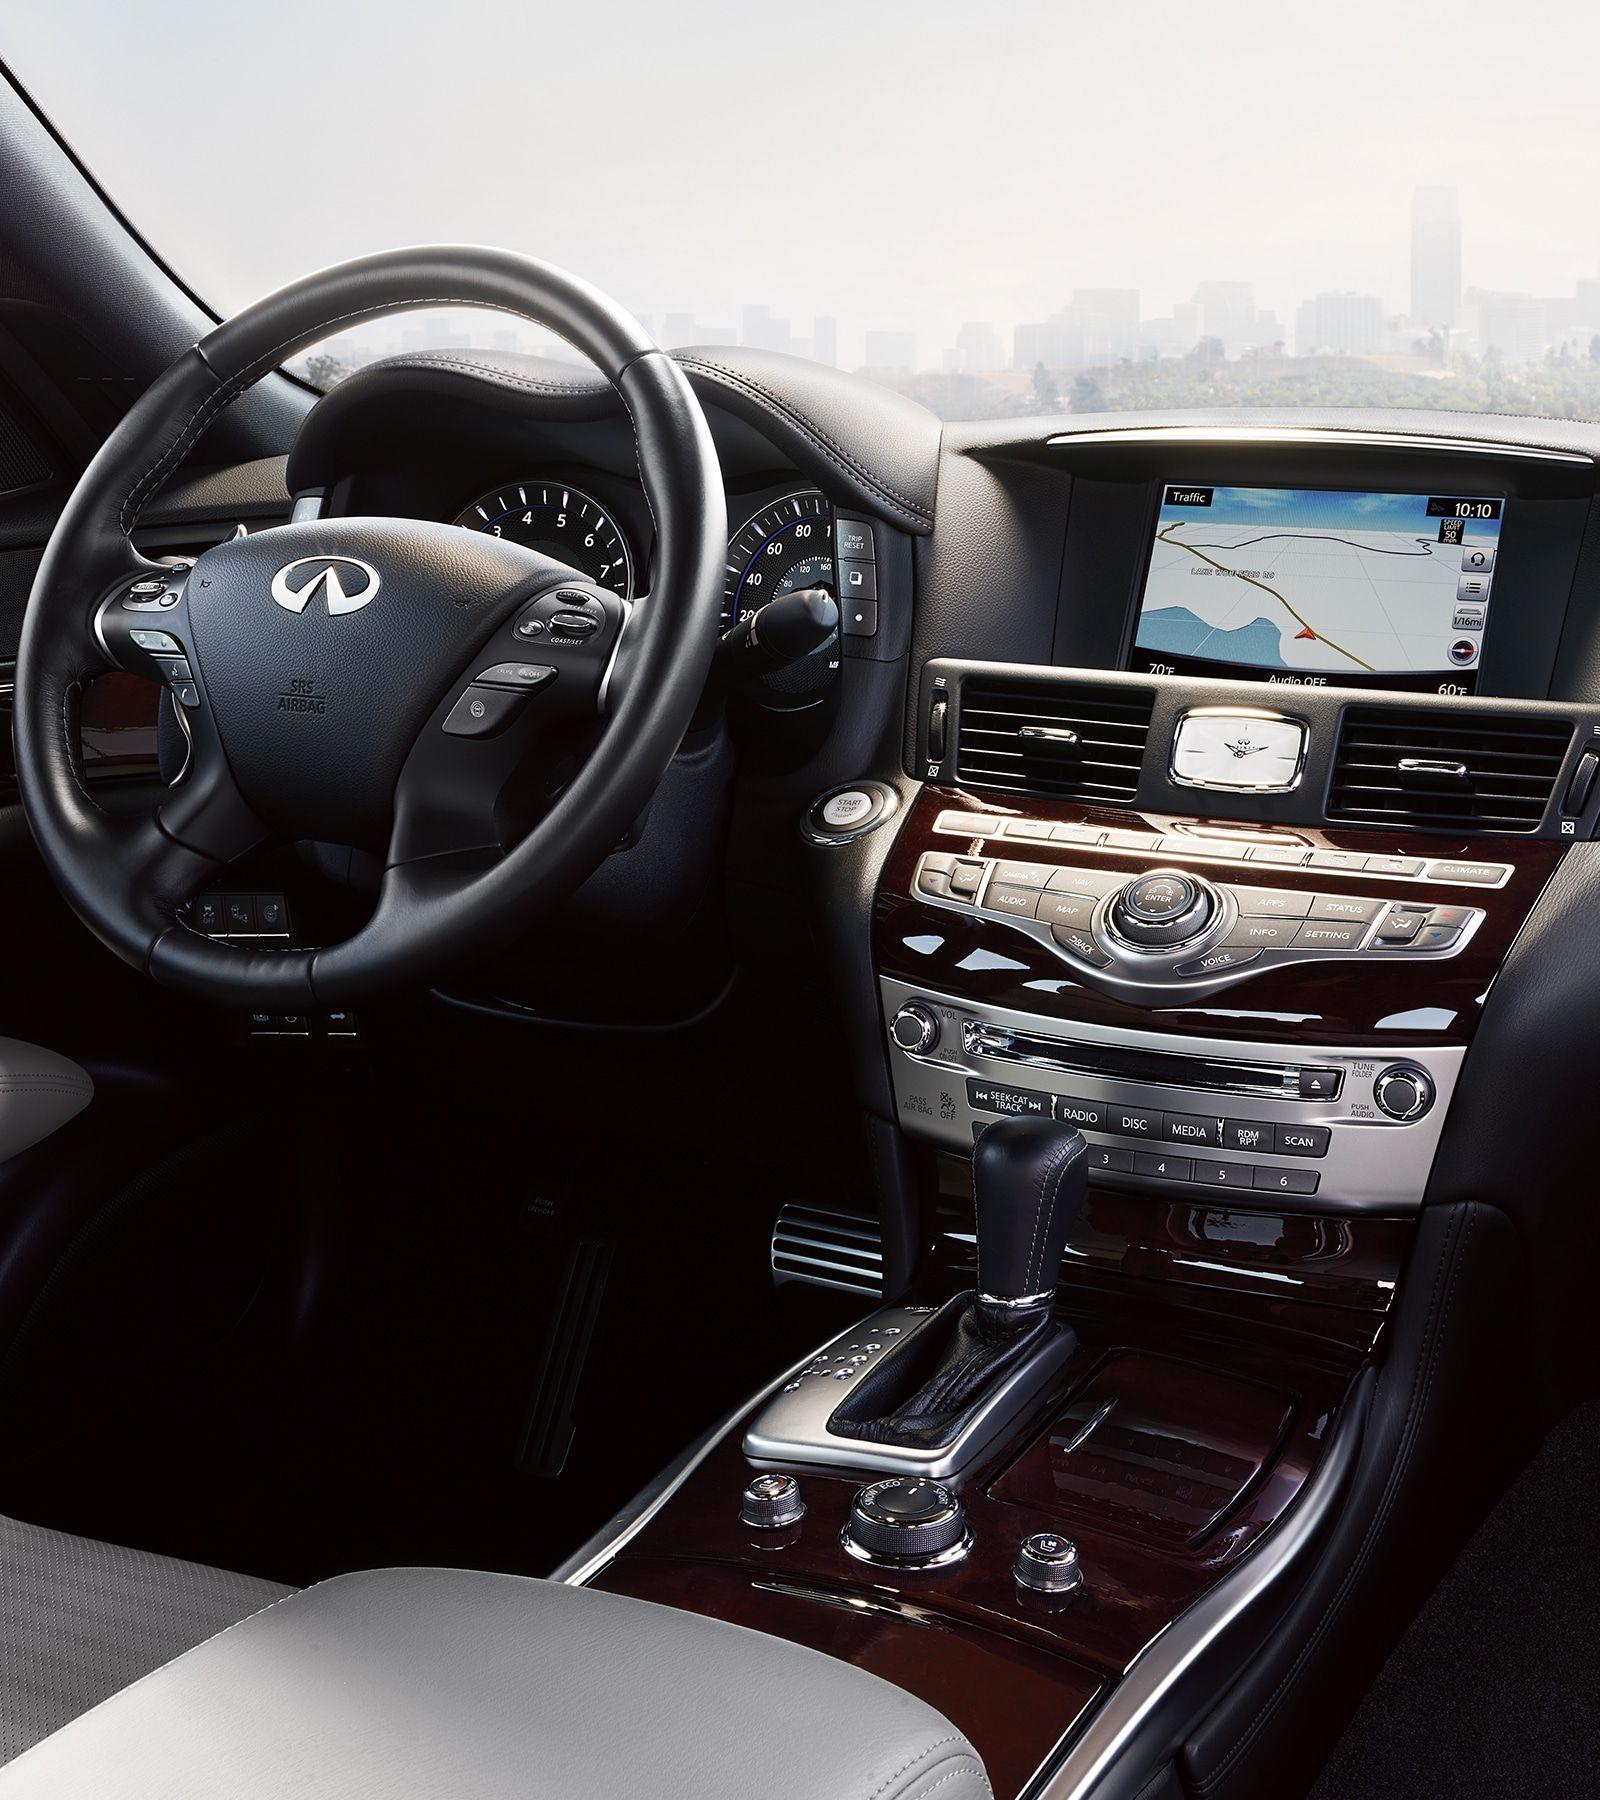 Infiniti Q70 Luxury Sedan Infiniti Usa Luxury Sedan Infiniti Usa Infiniti